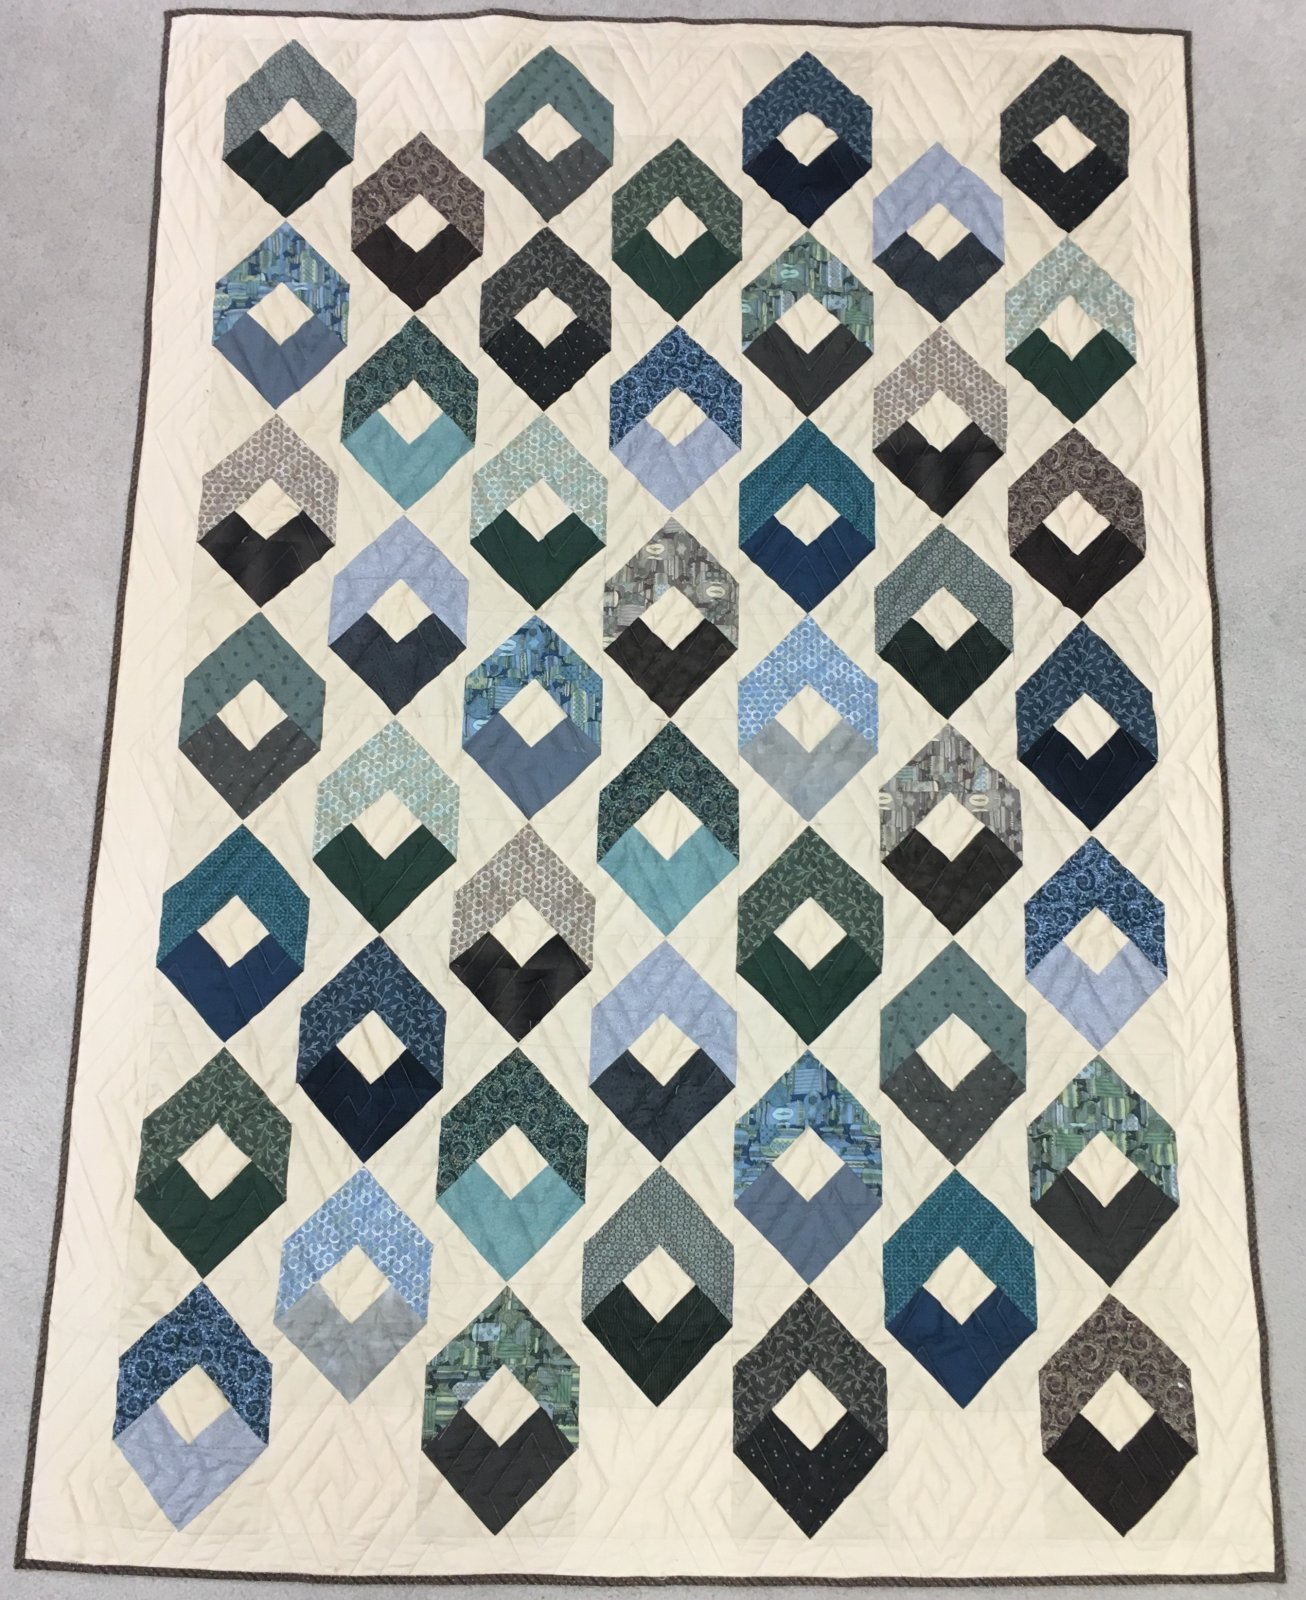 Georgetown Quilt Kit 92.5 x 92.5